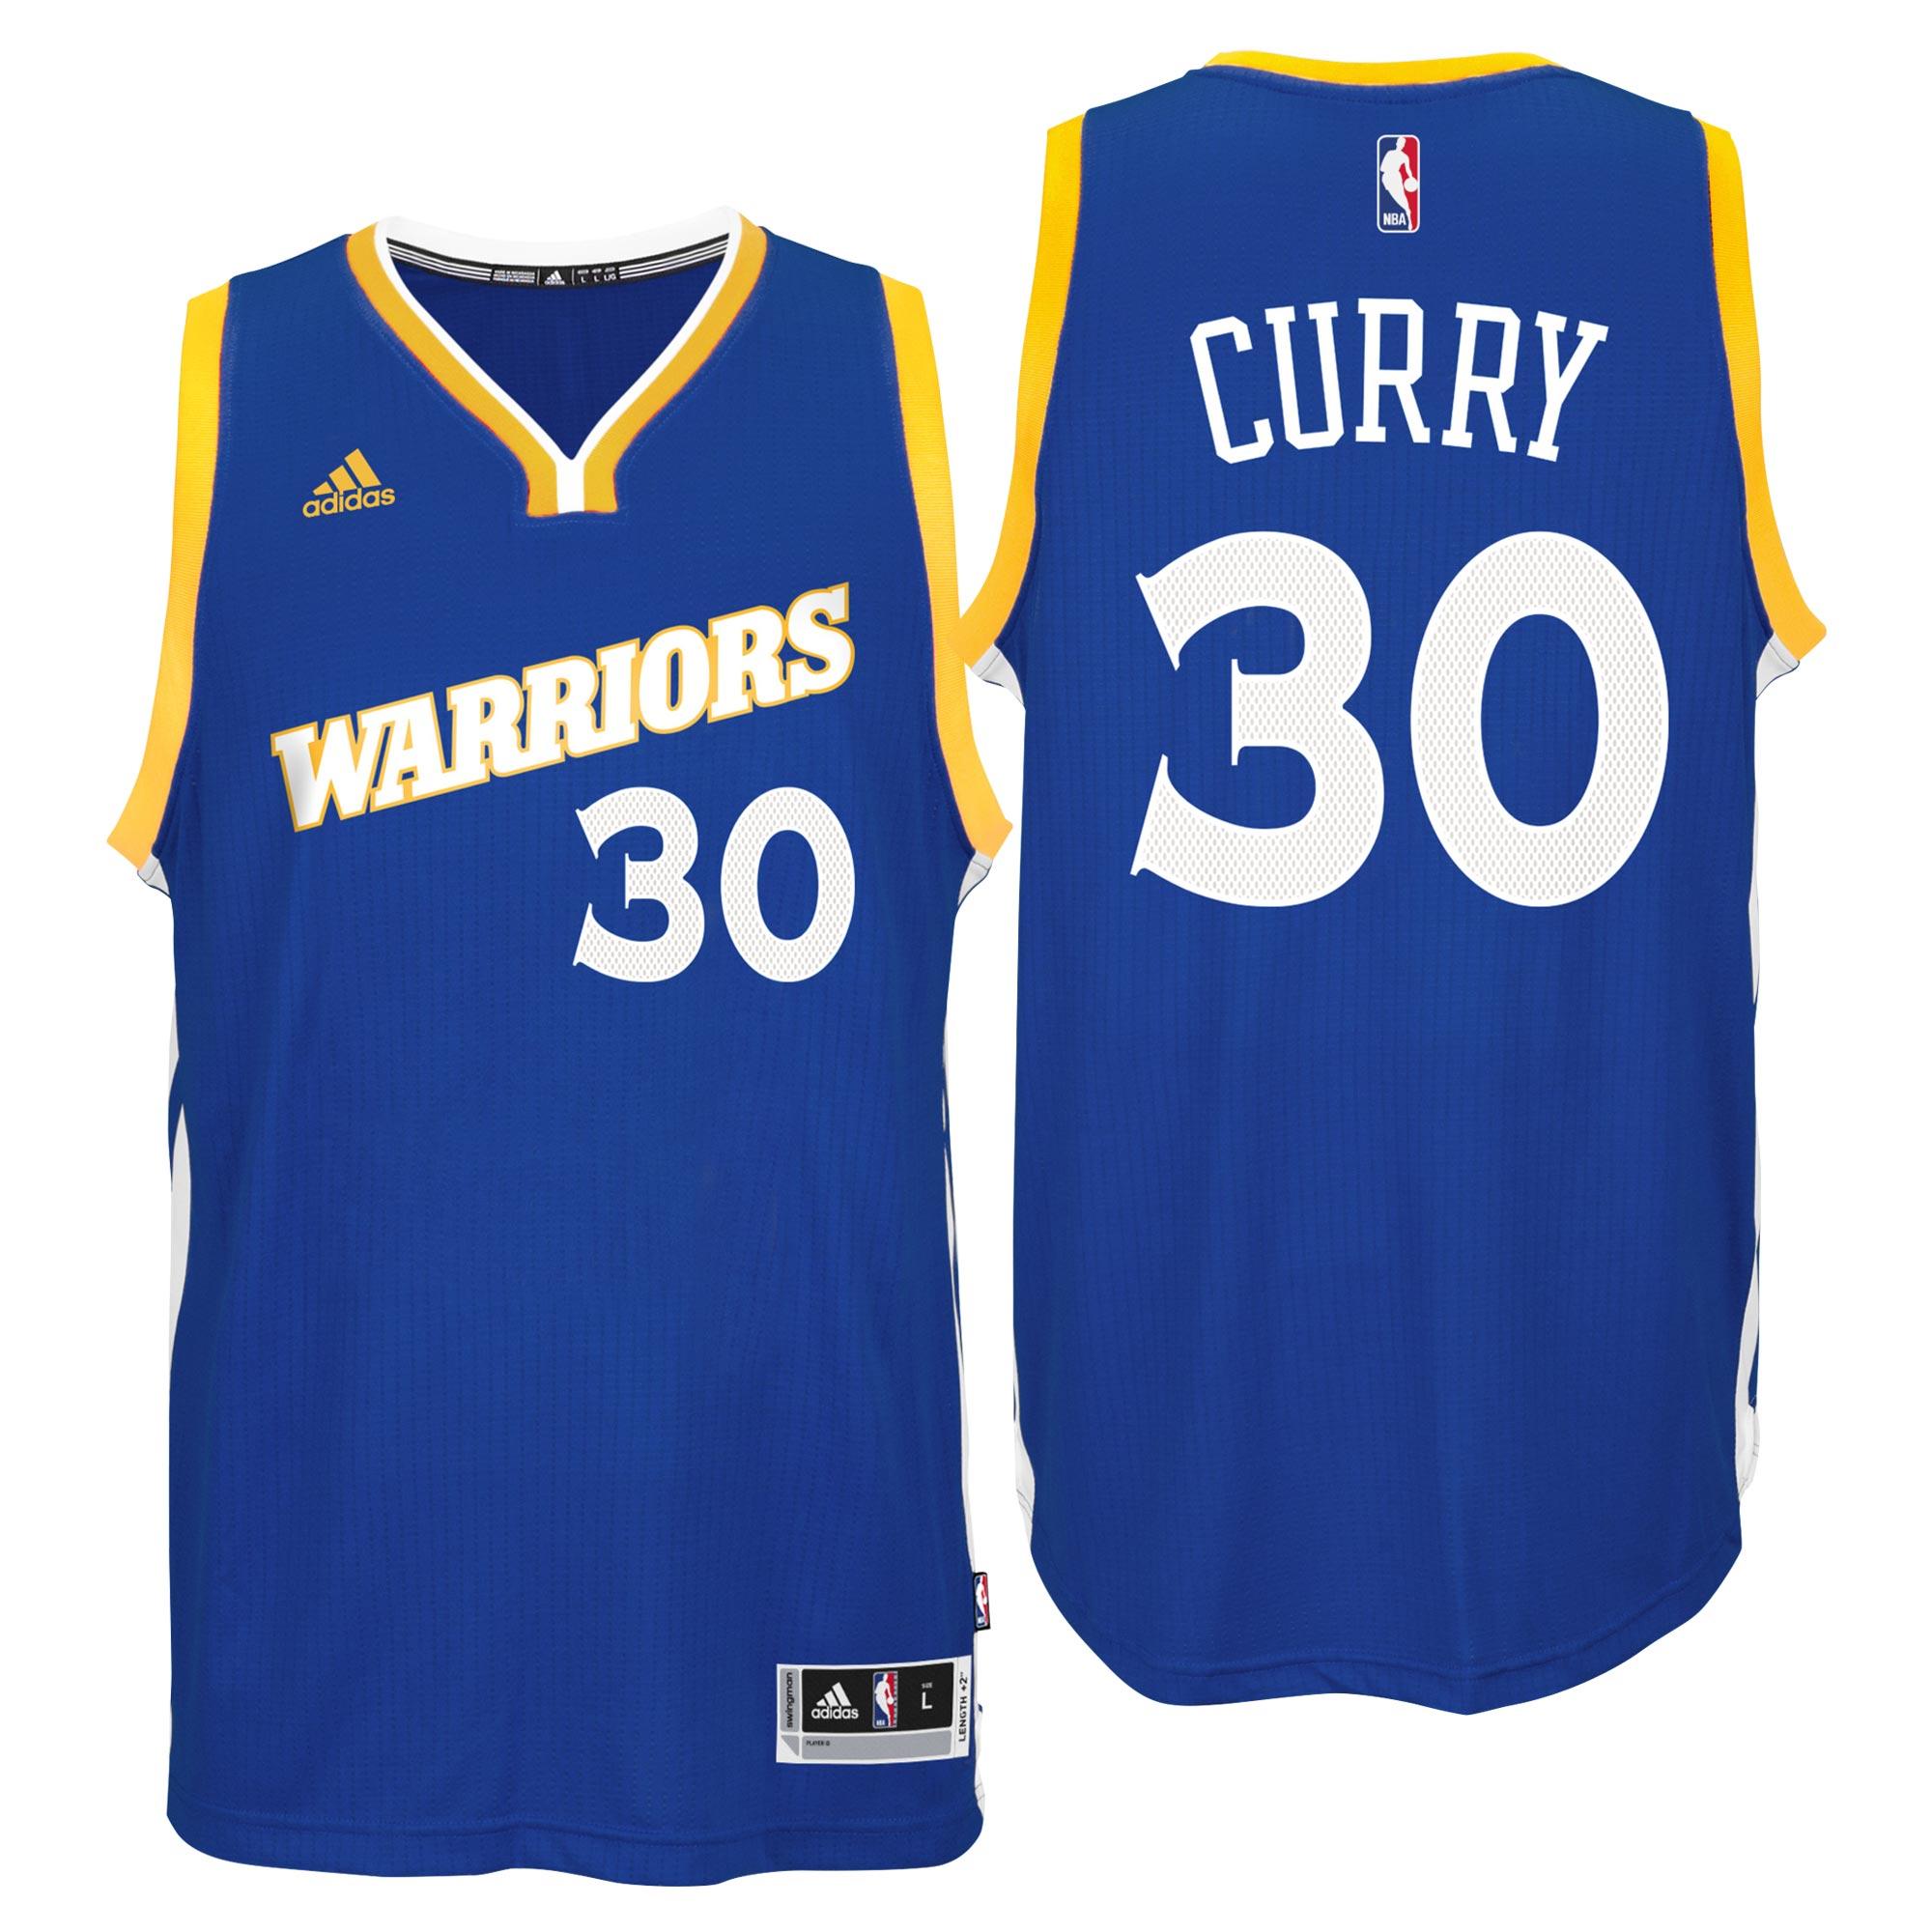 Golden State Warriors Road Stretch Swingman Jersey - Stephen Curry - M